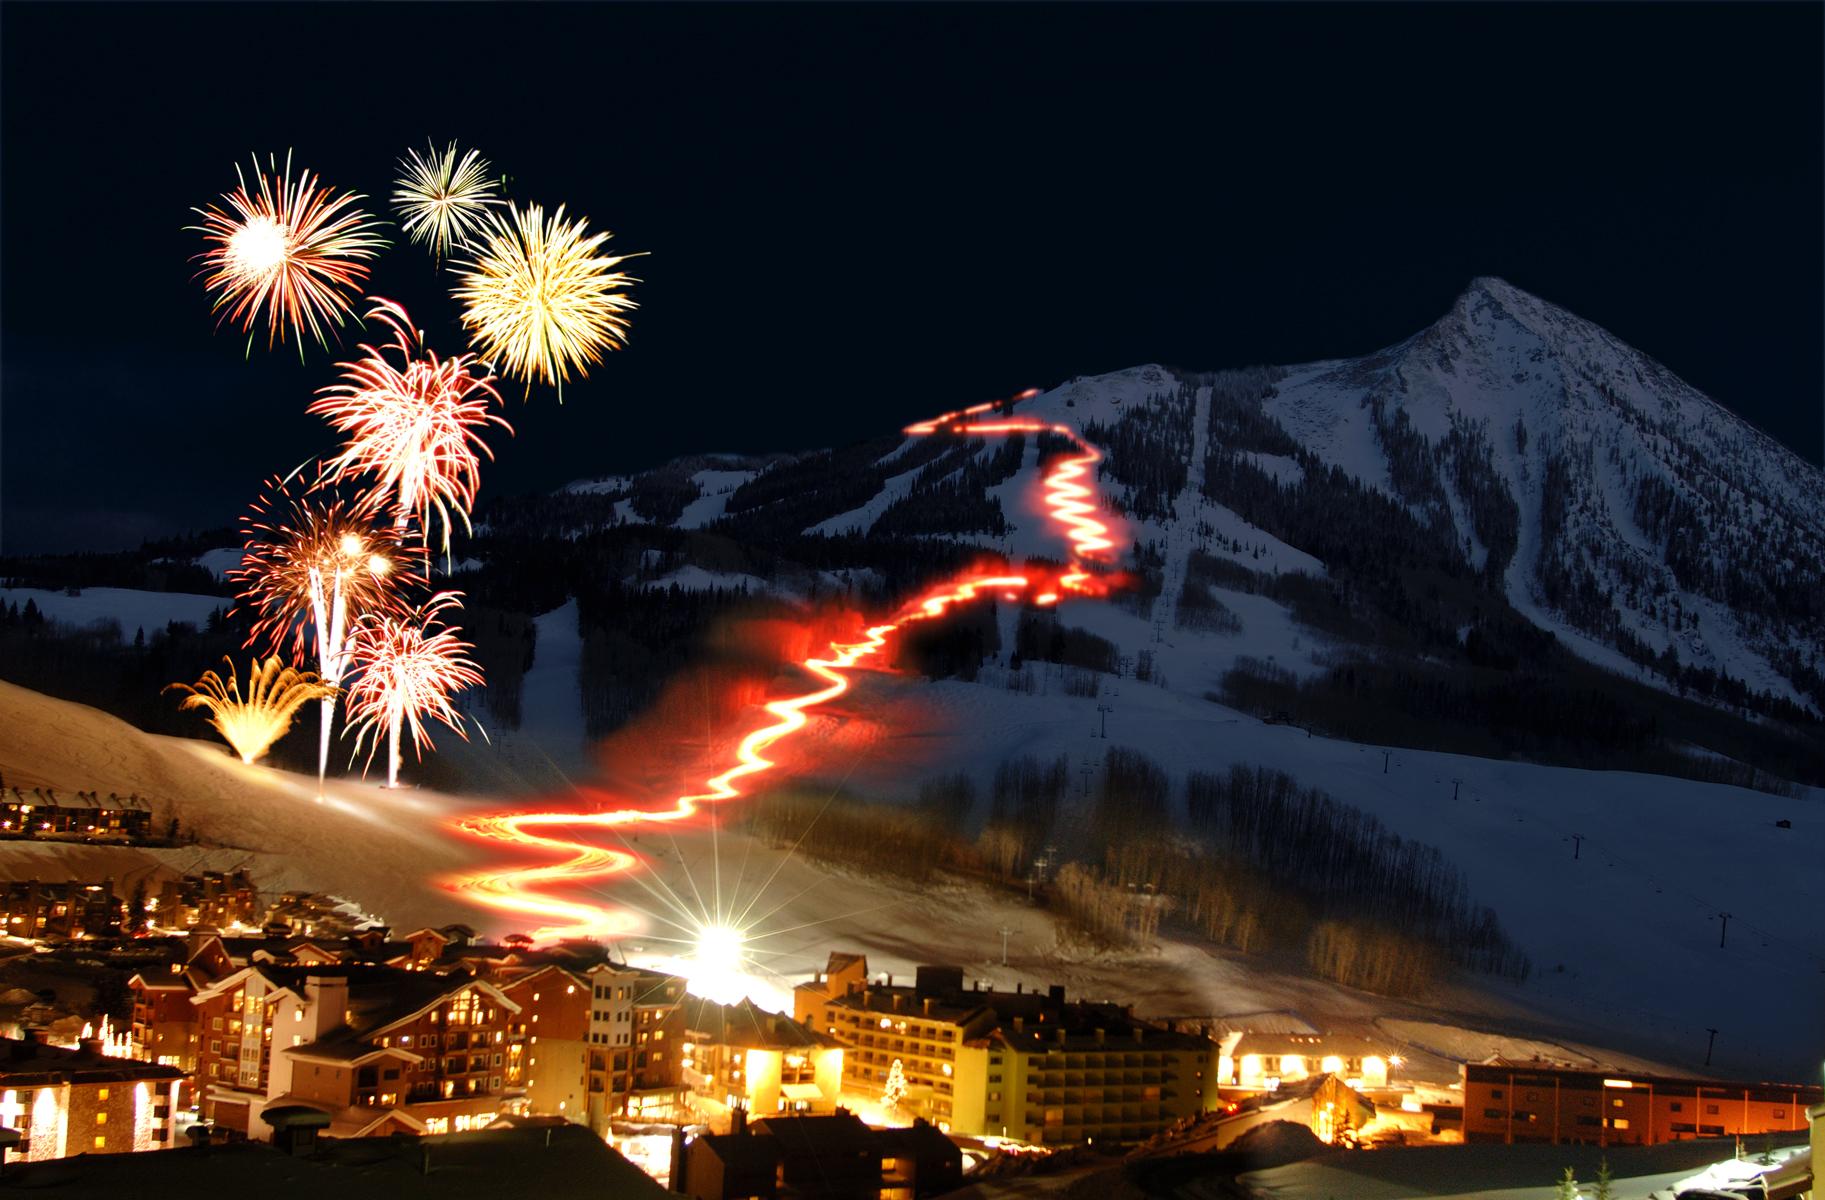 CBMR-TS_fireworkstorchlight_12-31-07